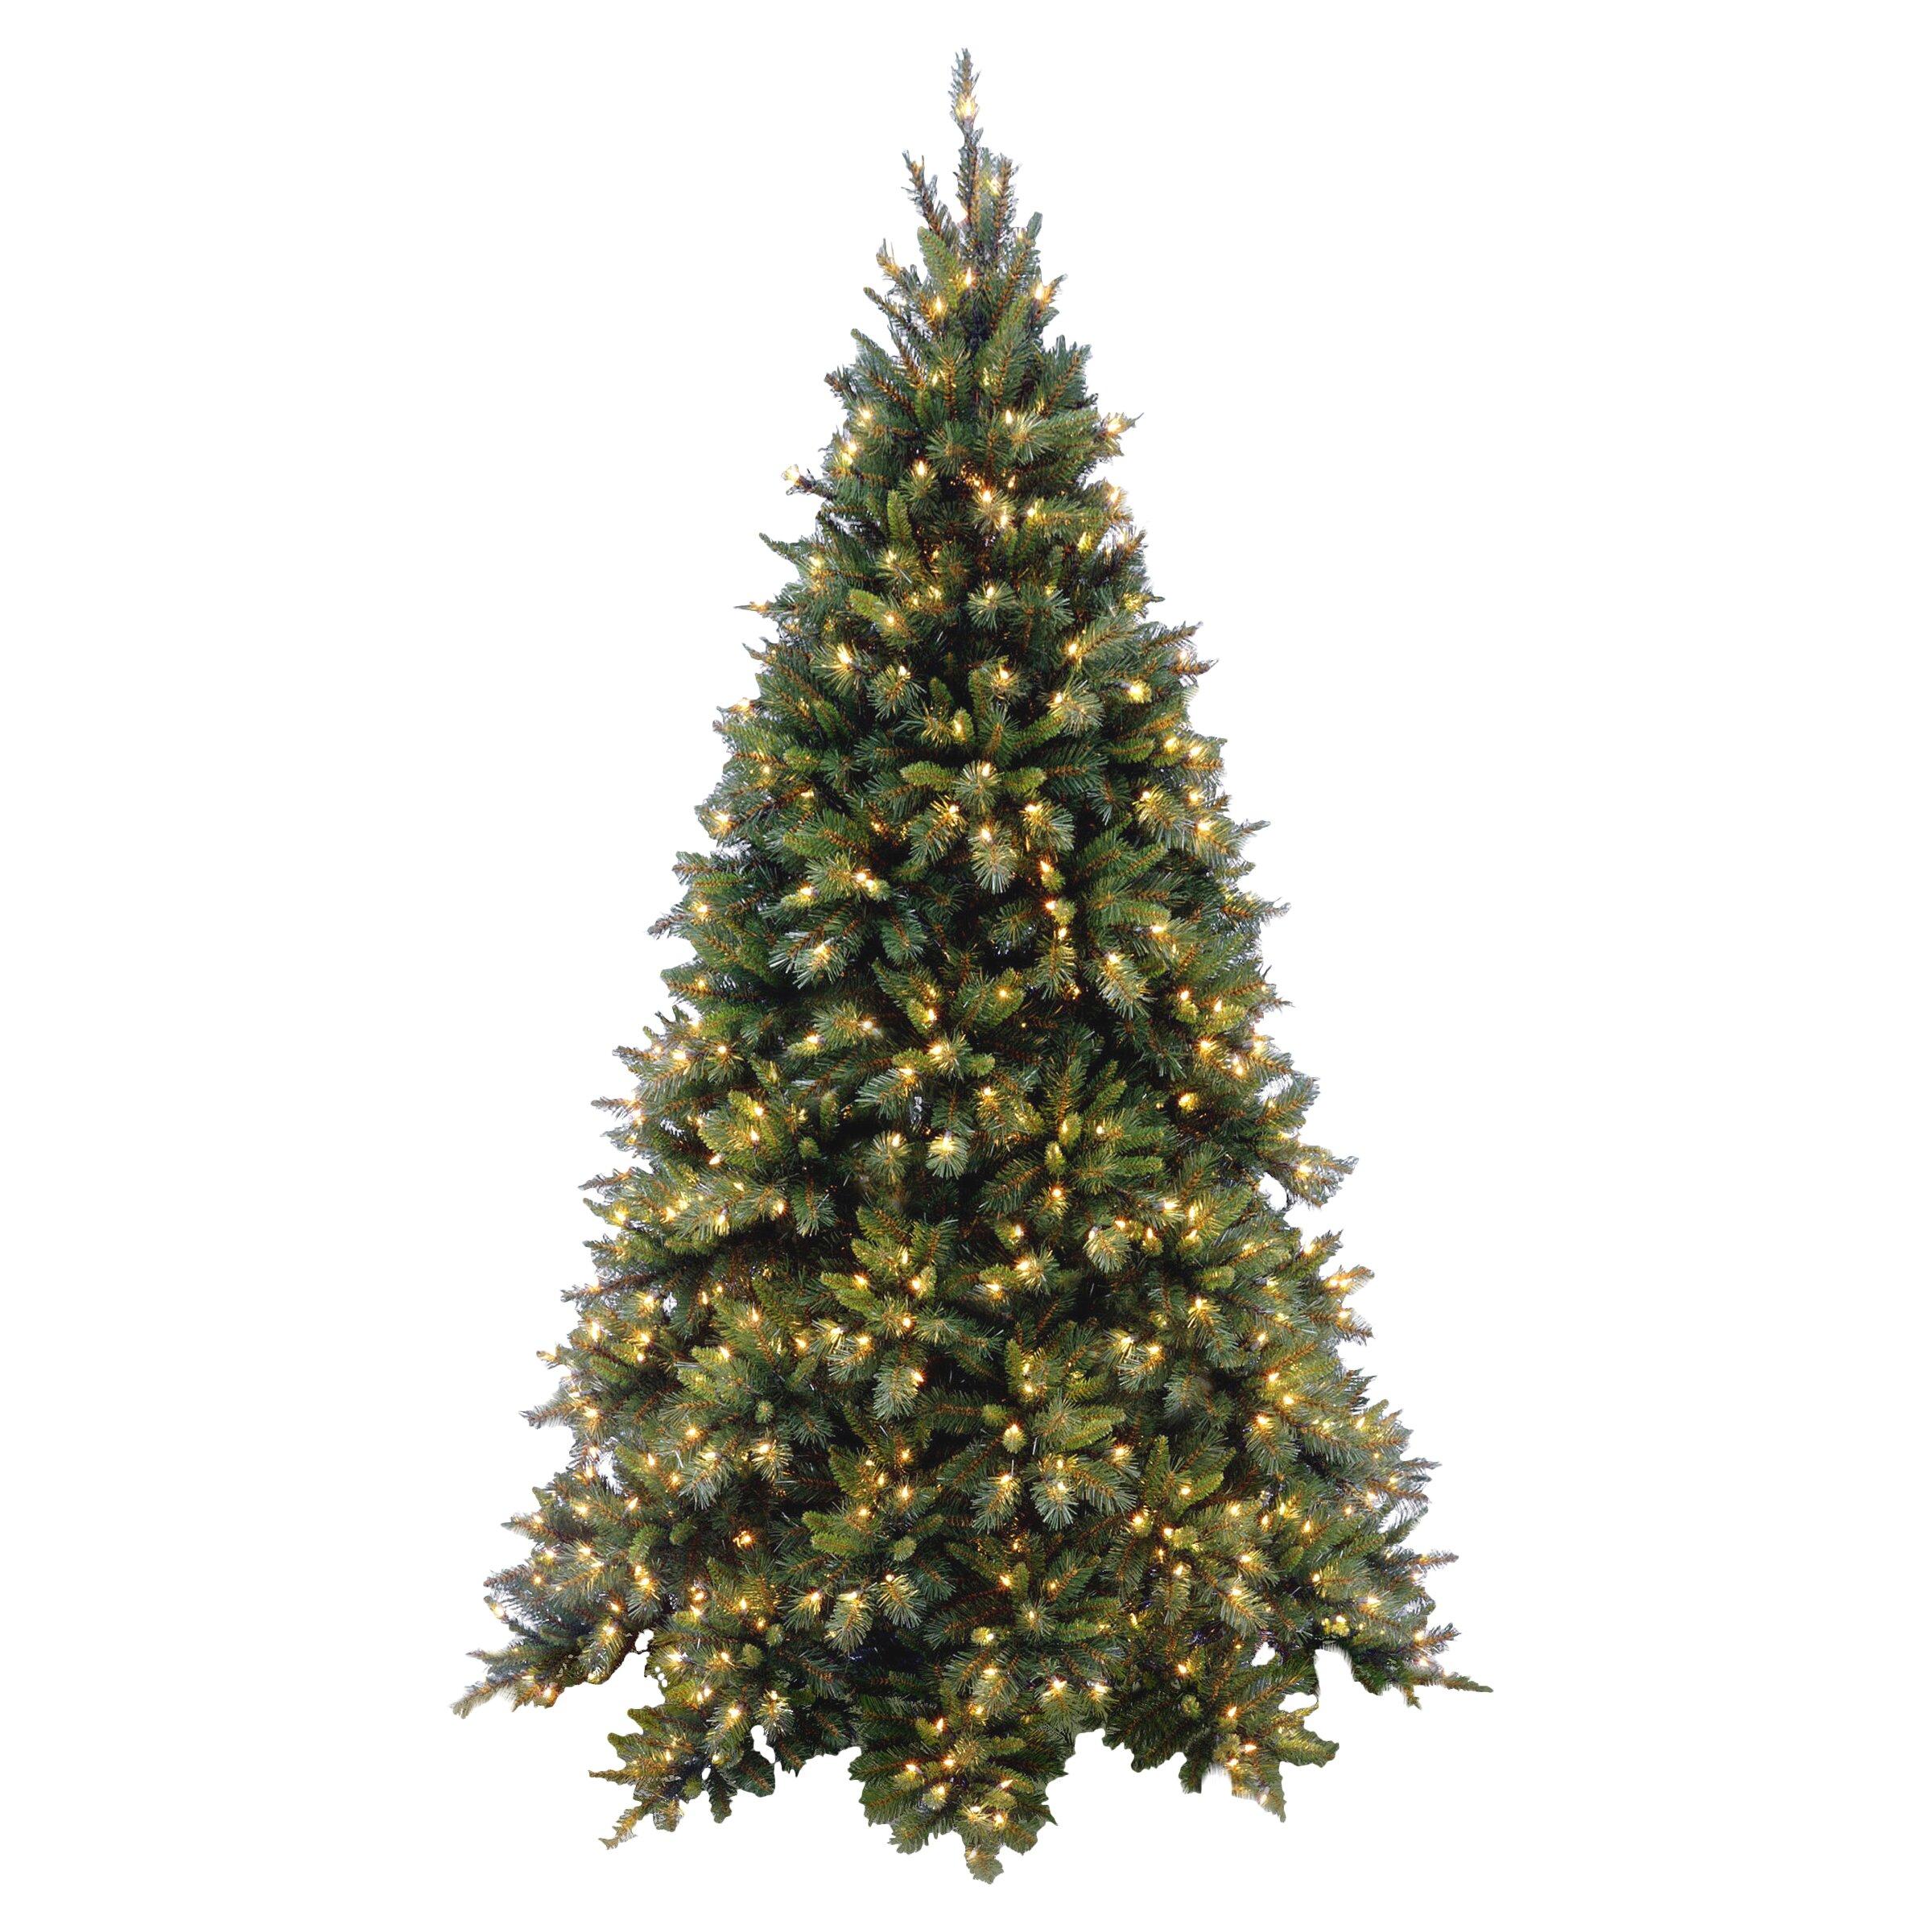 National Tree Co. Tiffany Fir 7.5' Green Artificial Christmas Tree ...